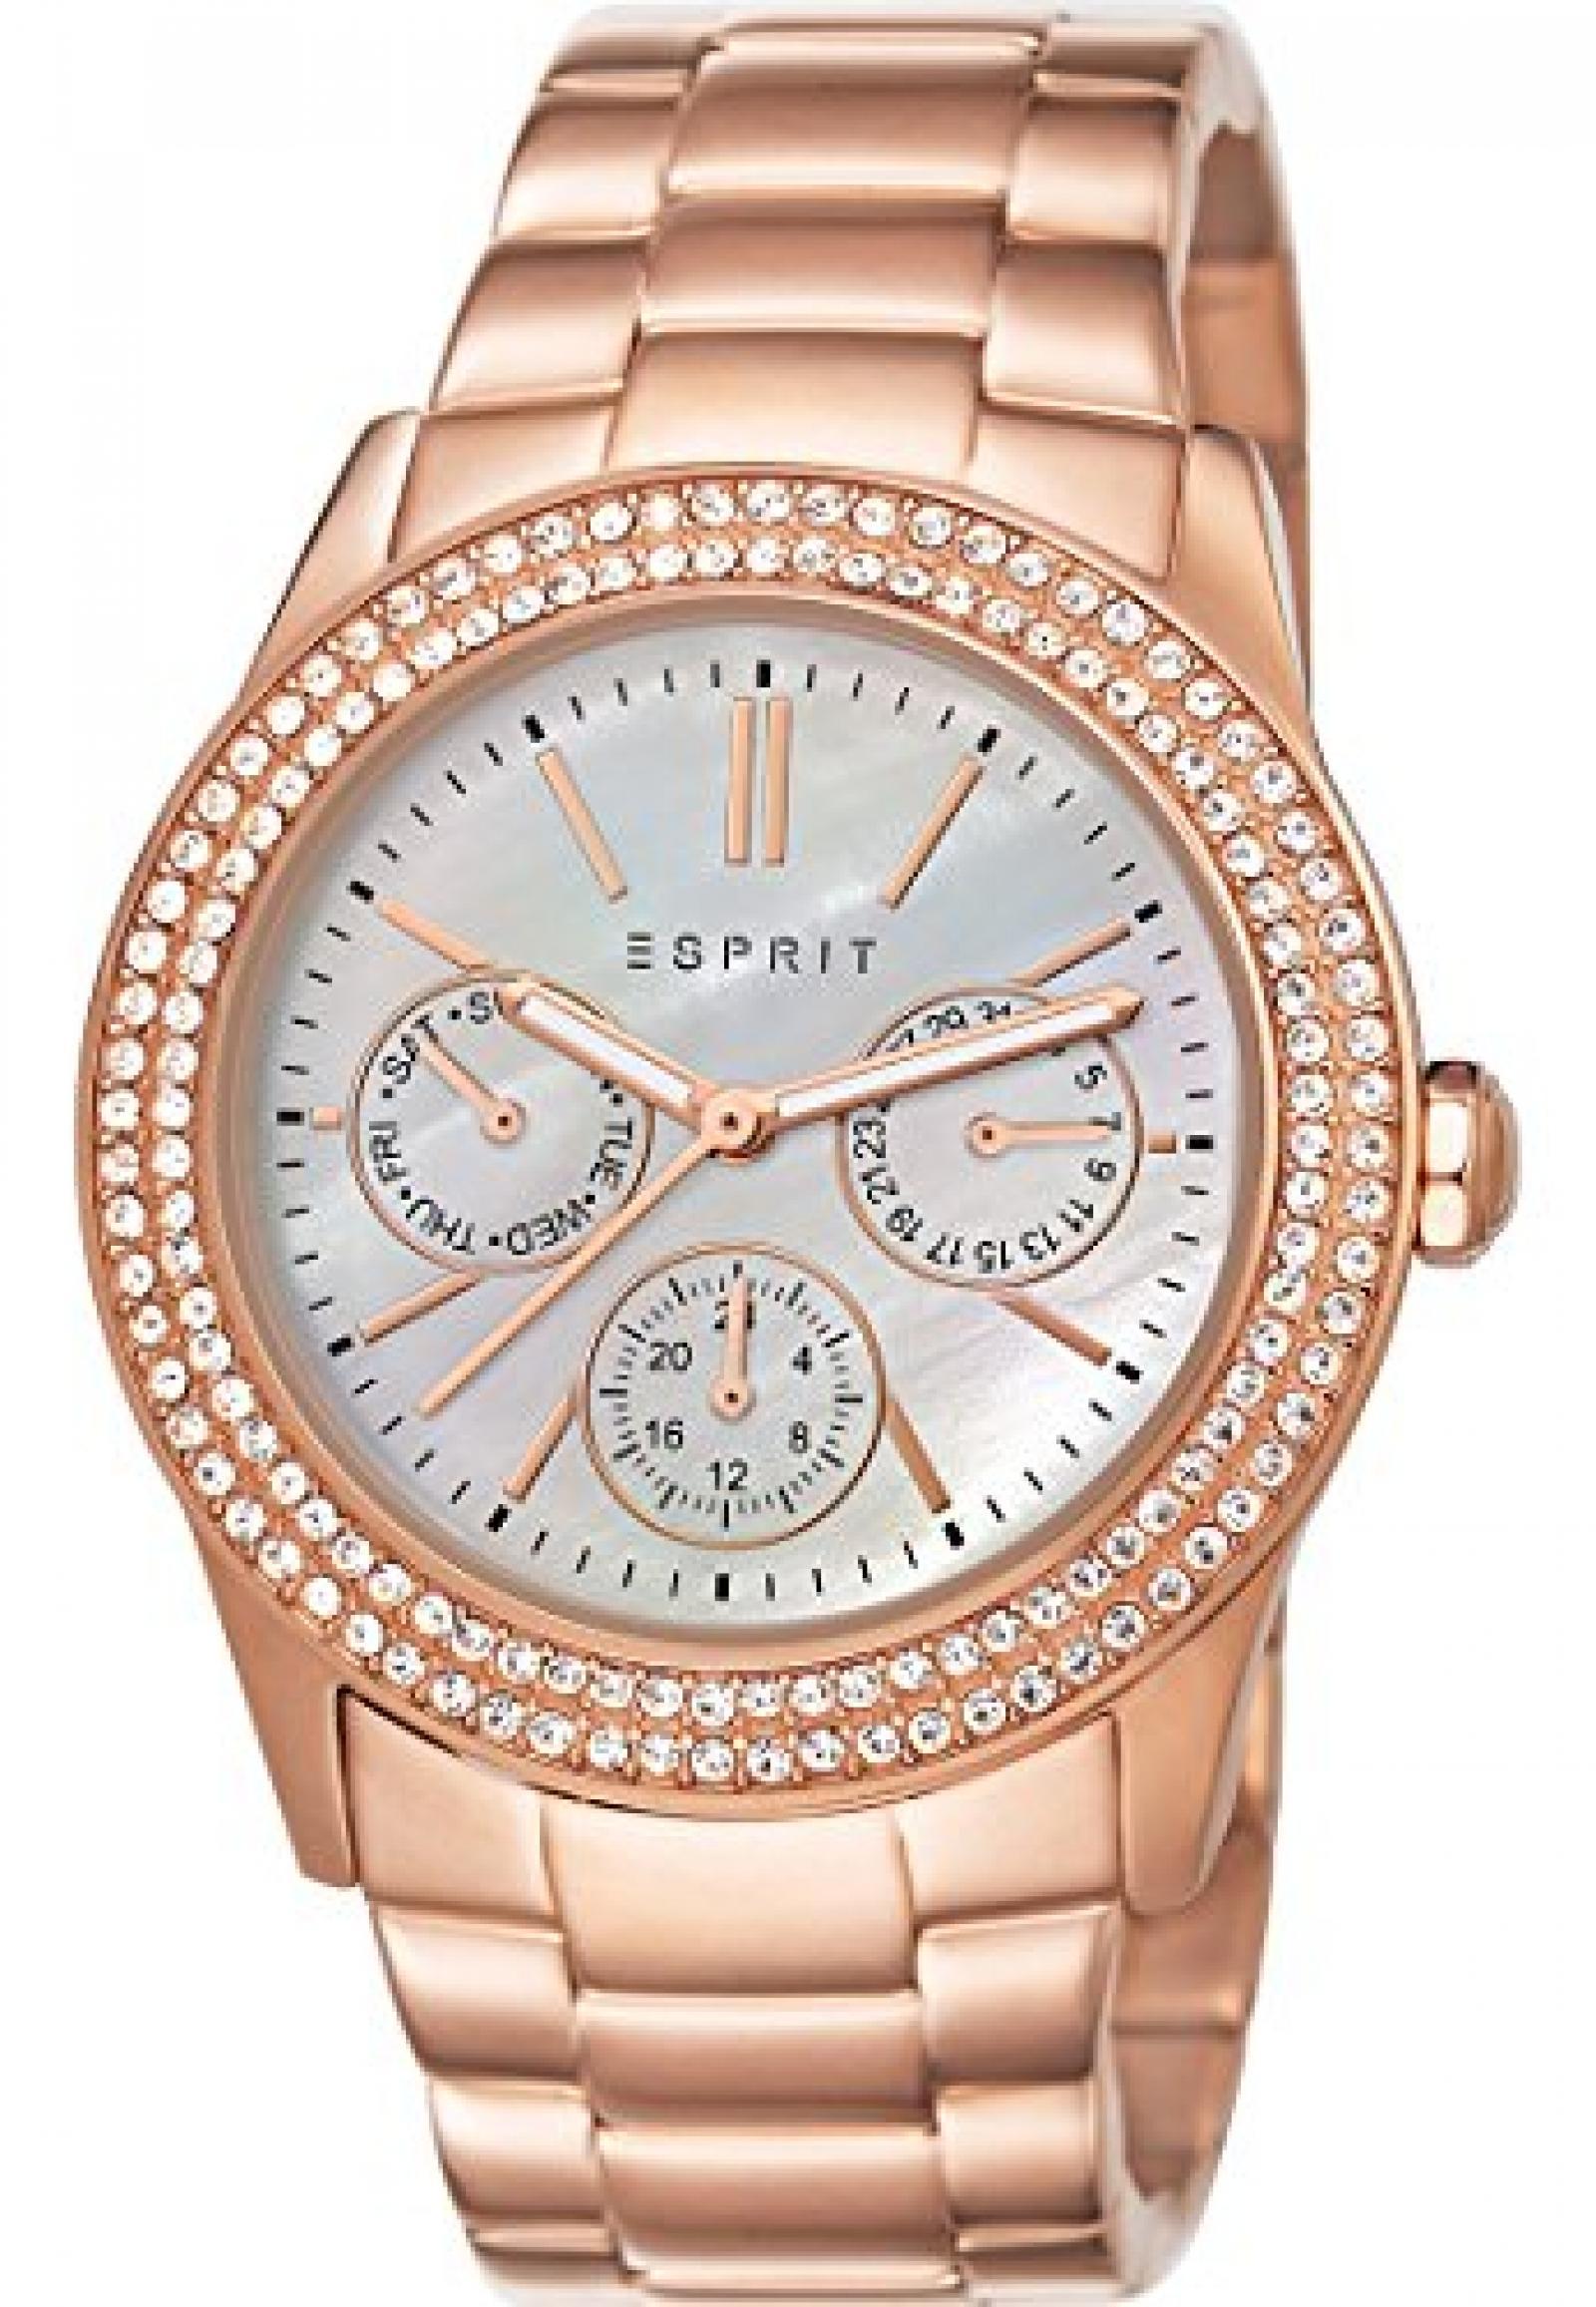 Esprit Damen-Armbanduhr Analog Quarz (One Size, perlmutt)